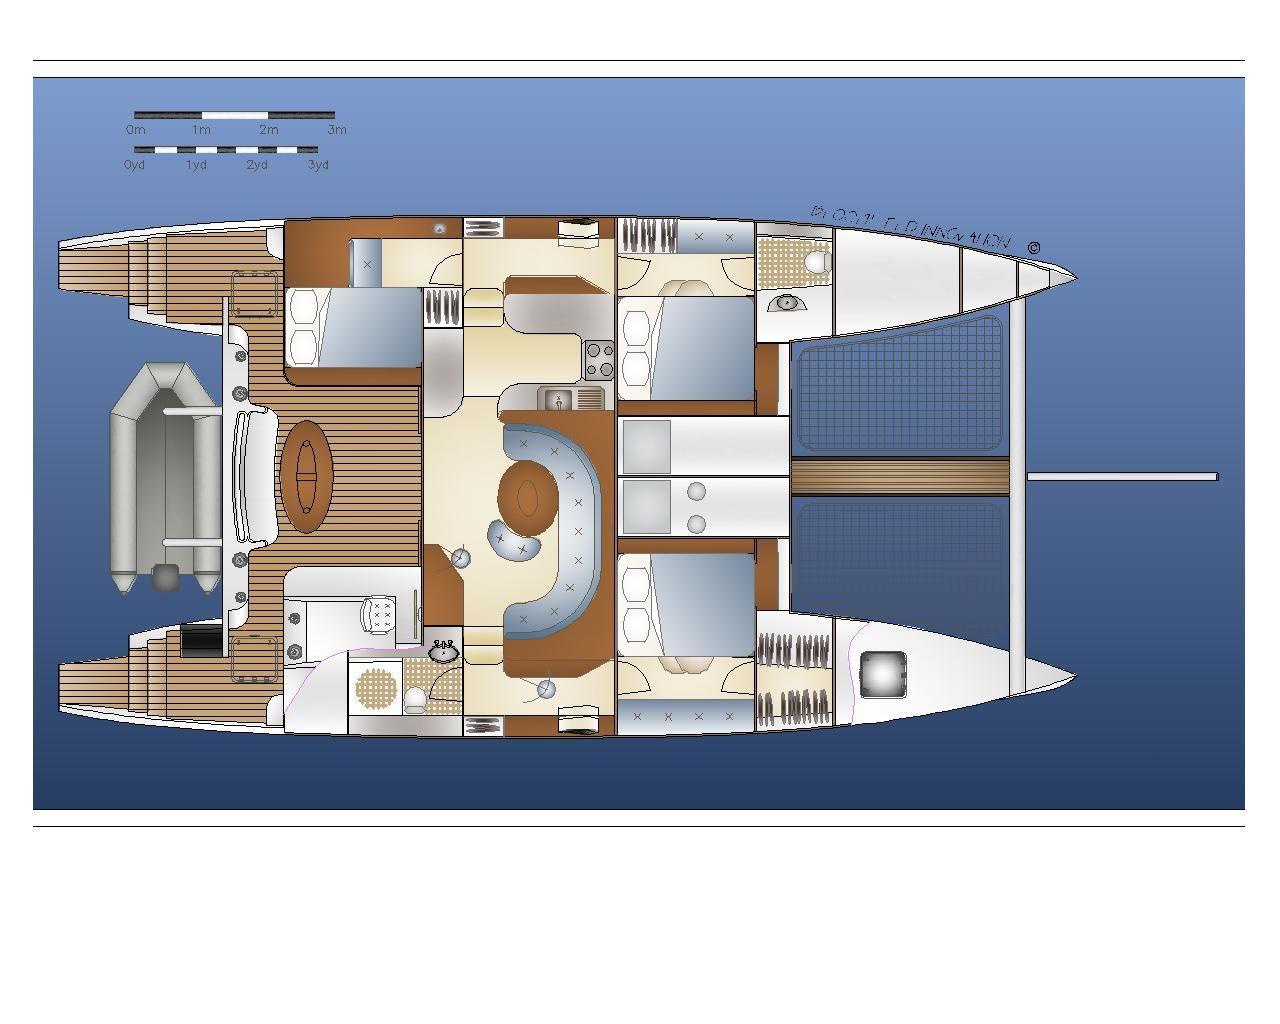 Pin by captain lee on catamaran boats | Sailboat plans